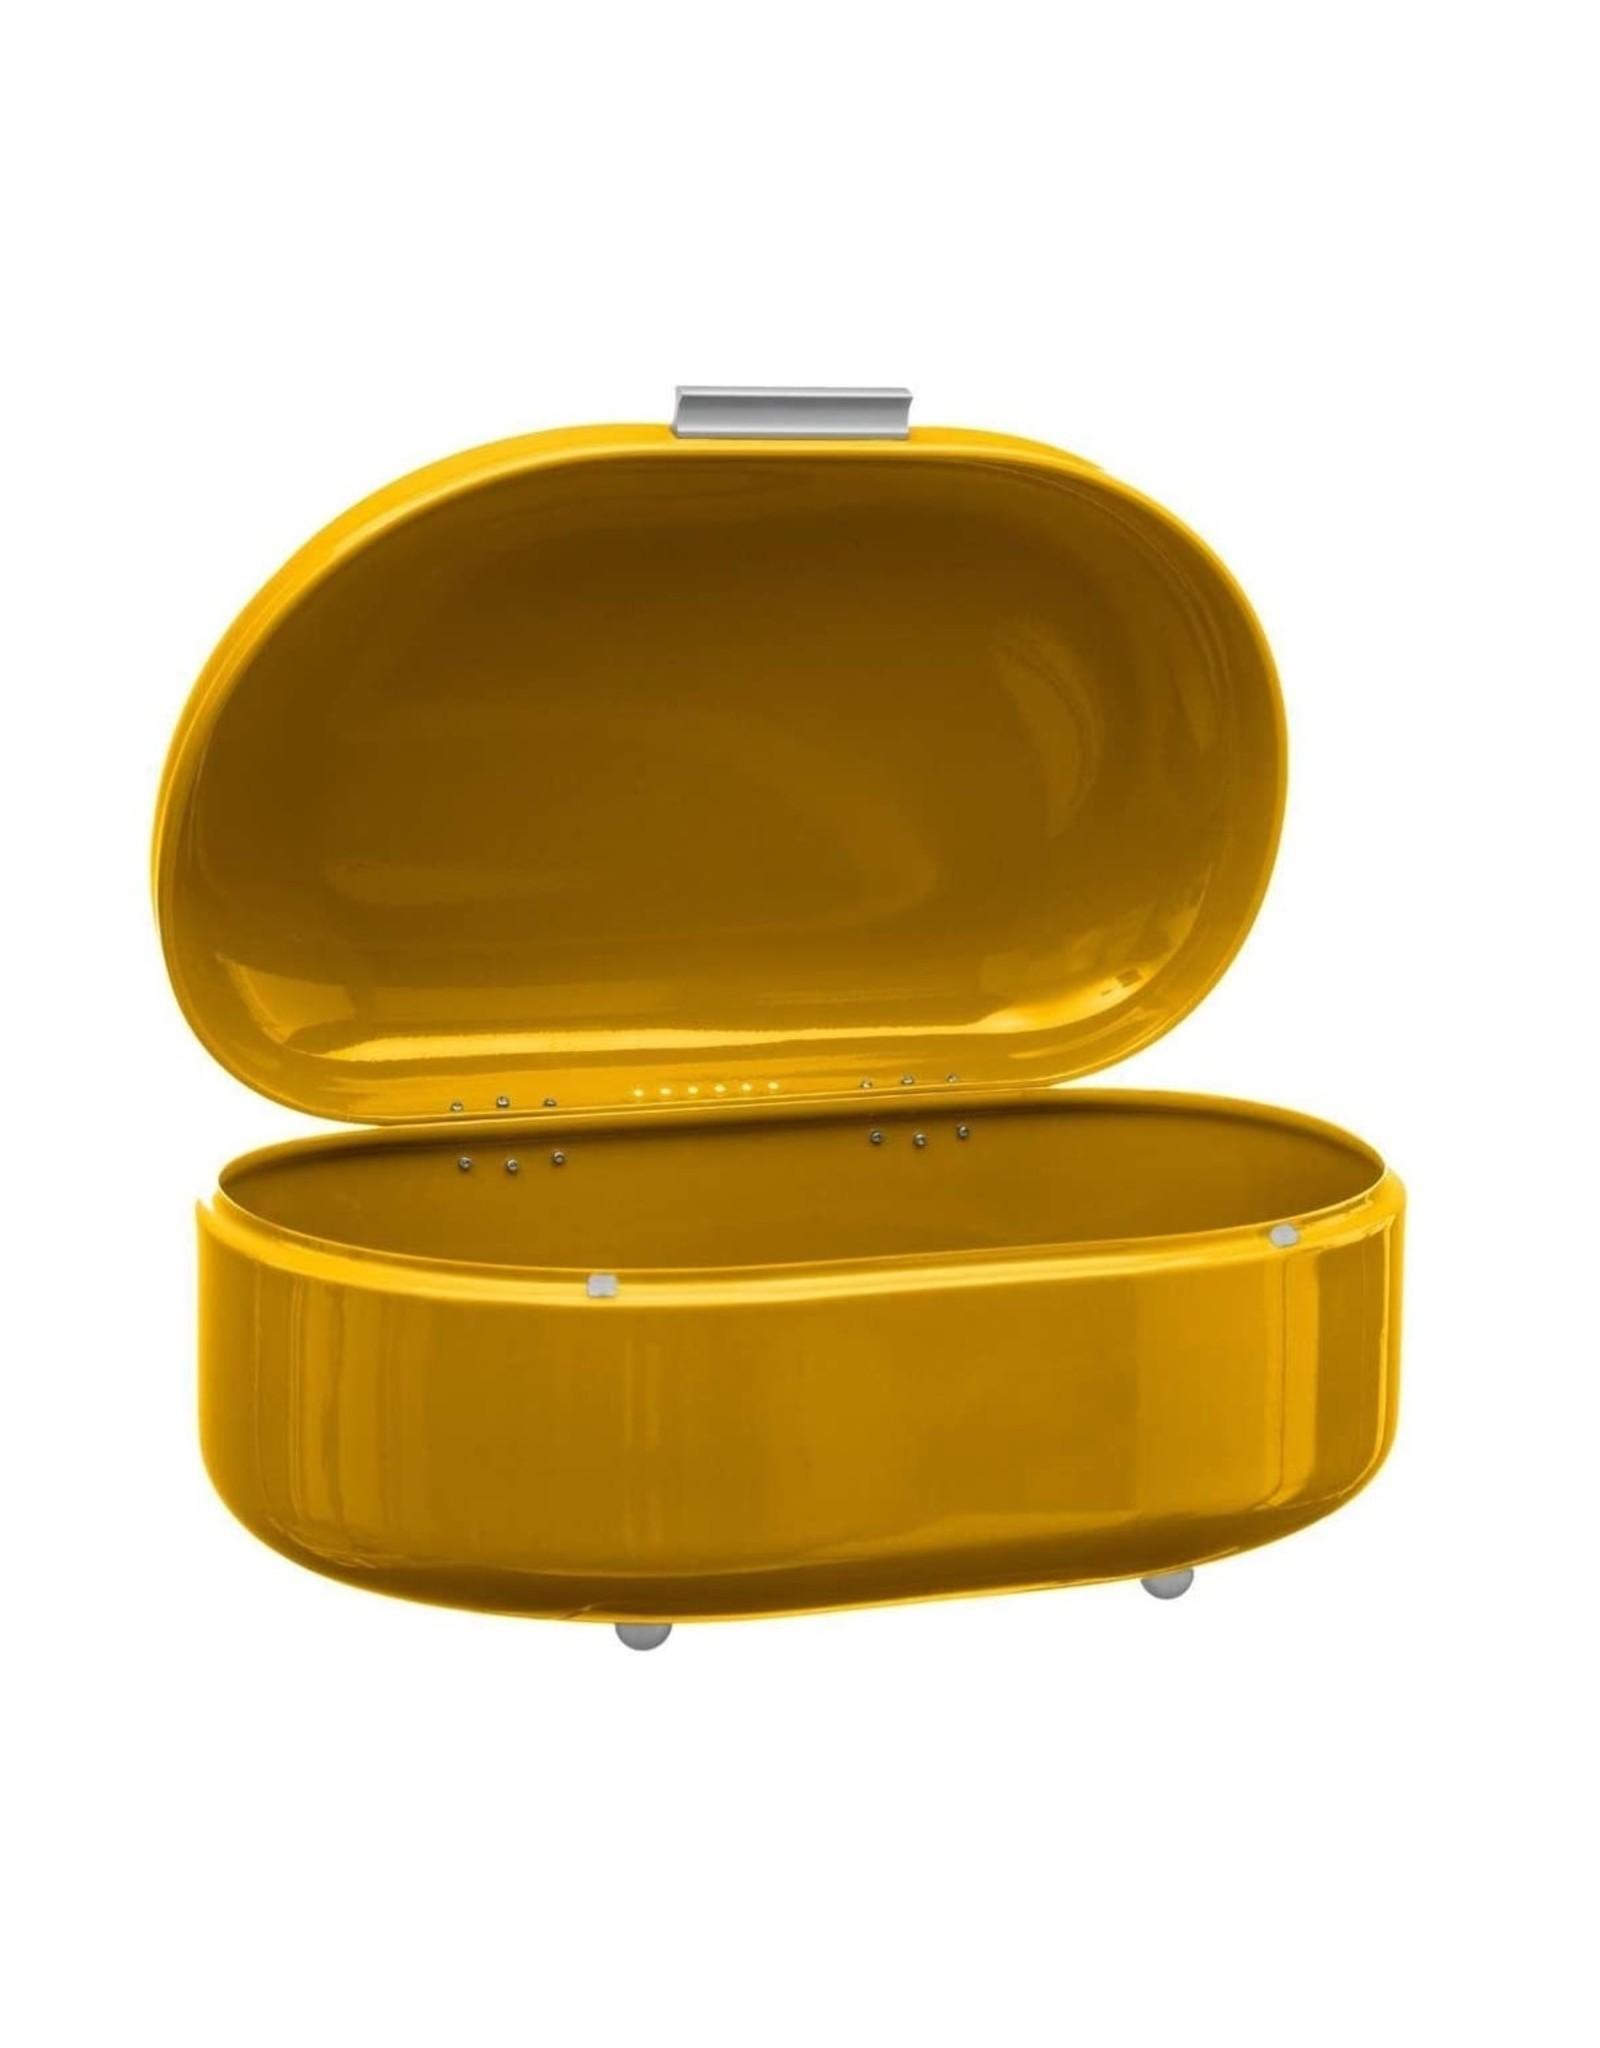 5Five - Broodtrommel - Metaal - Ovaal - Geel